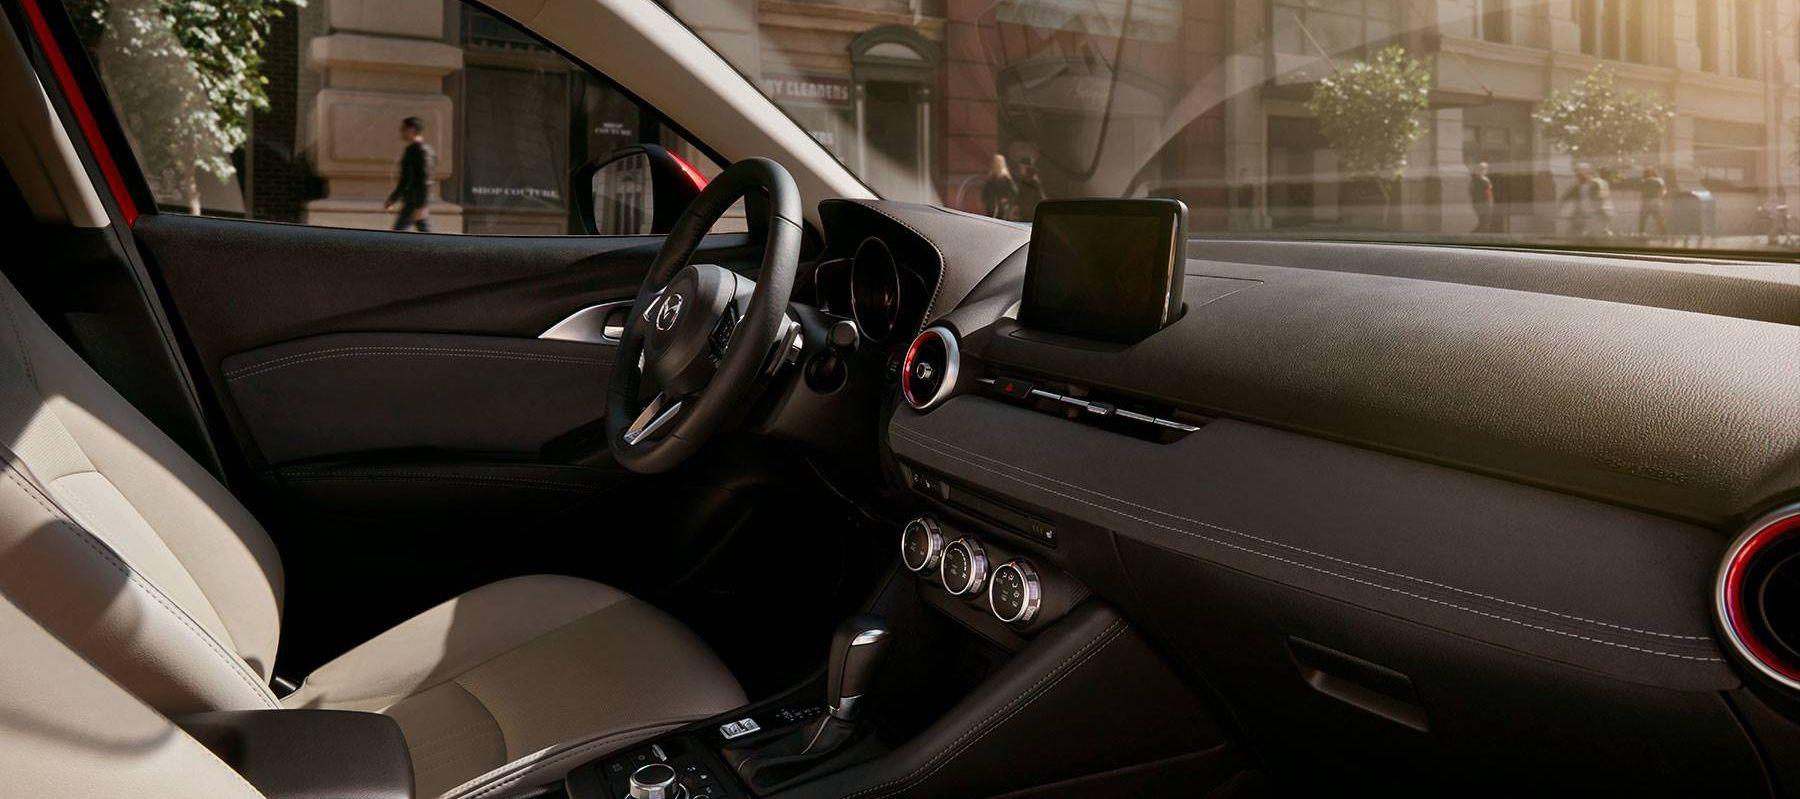 The Elegant Interior of the Mazda CX-3